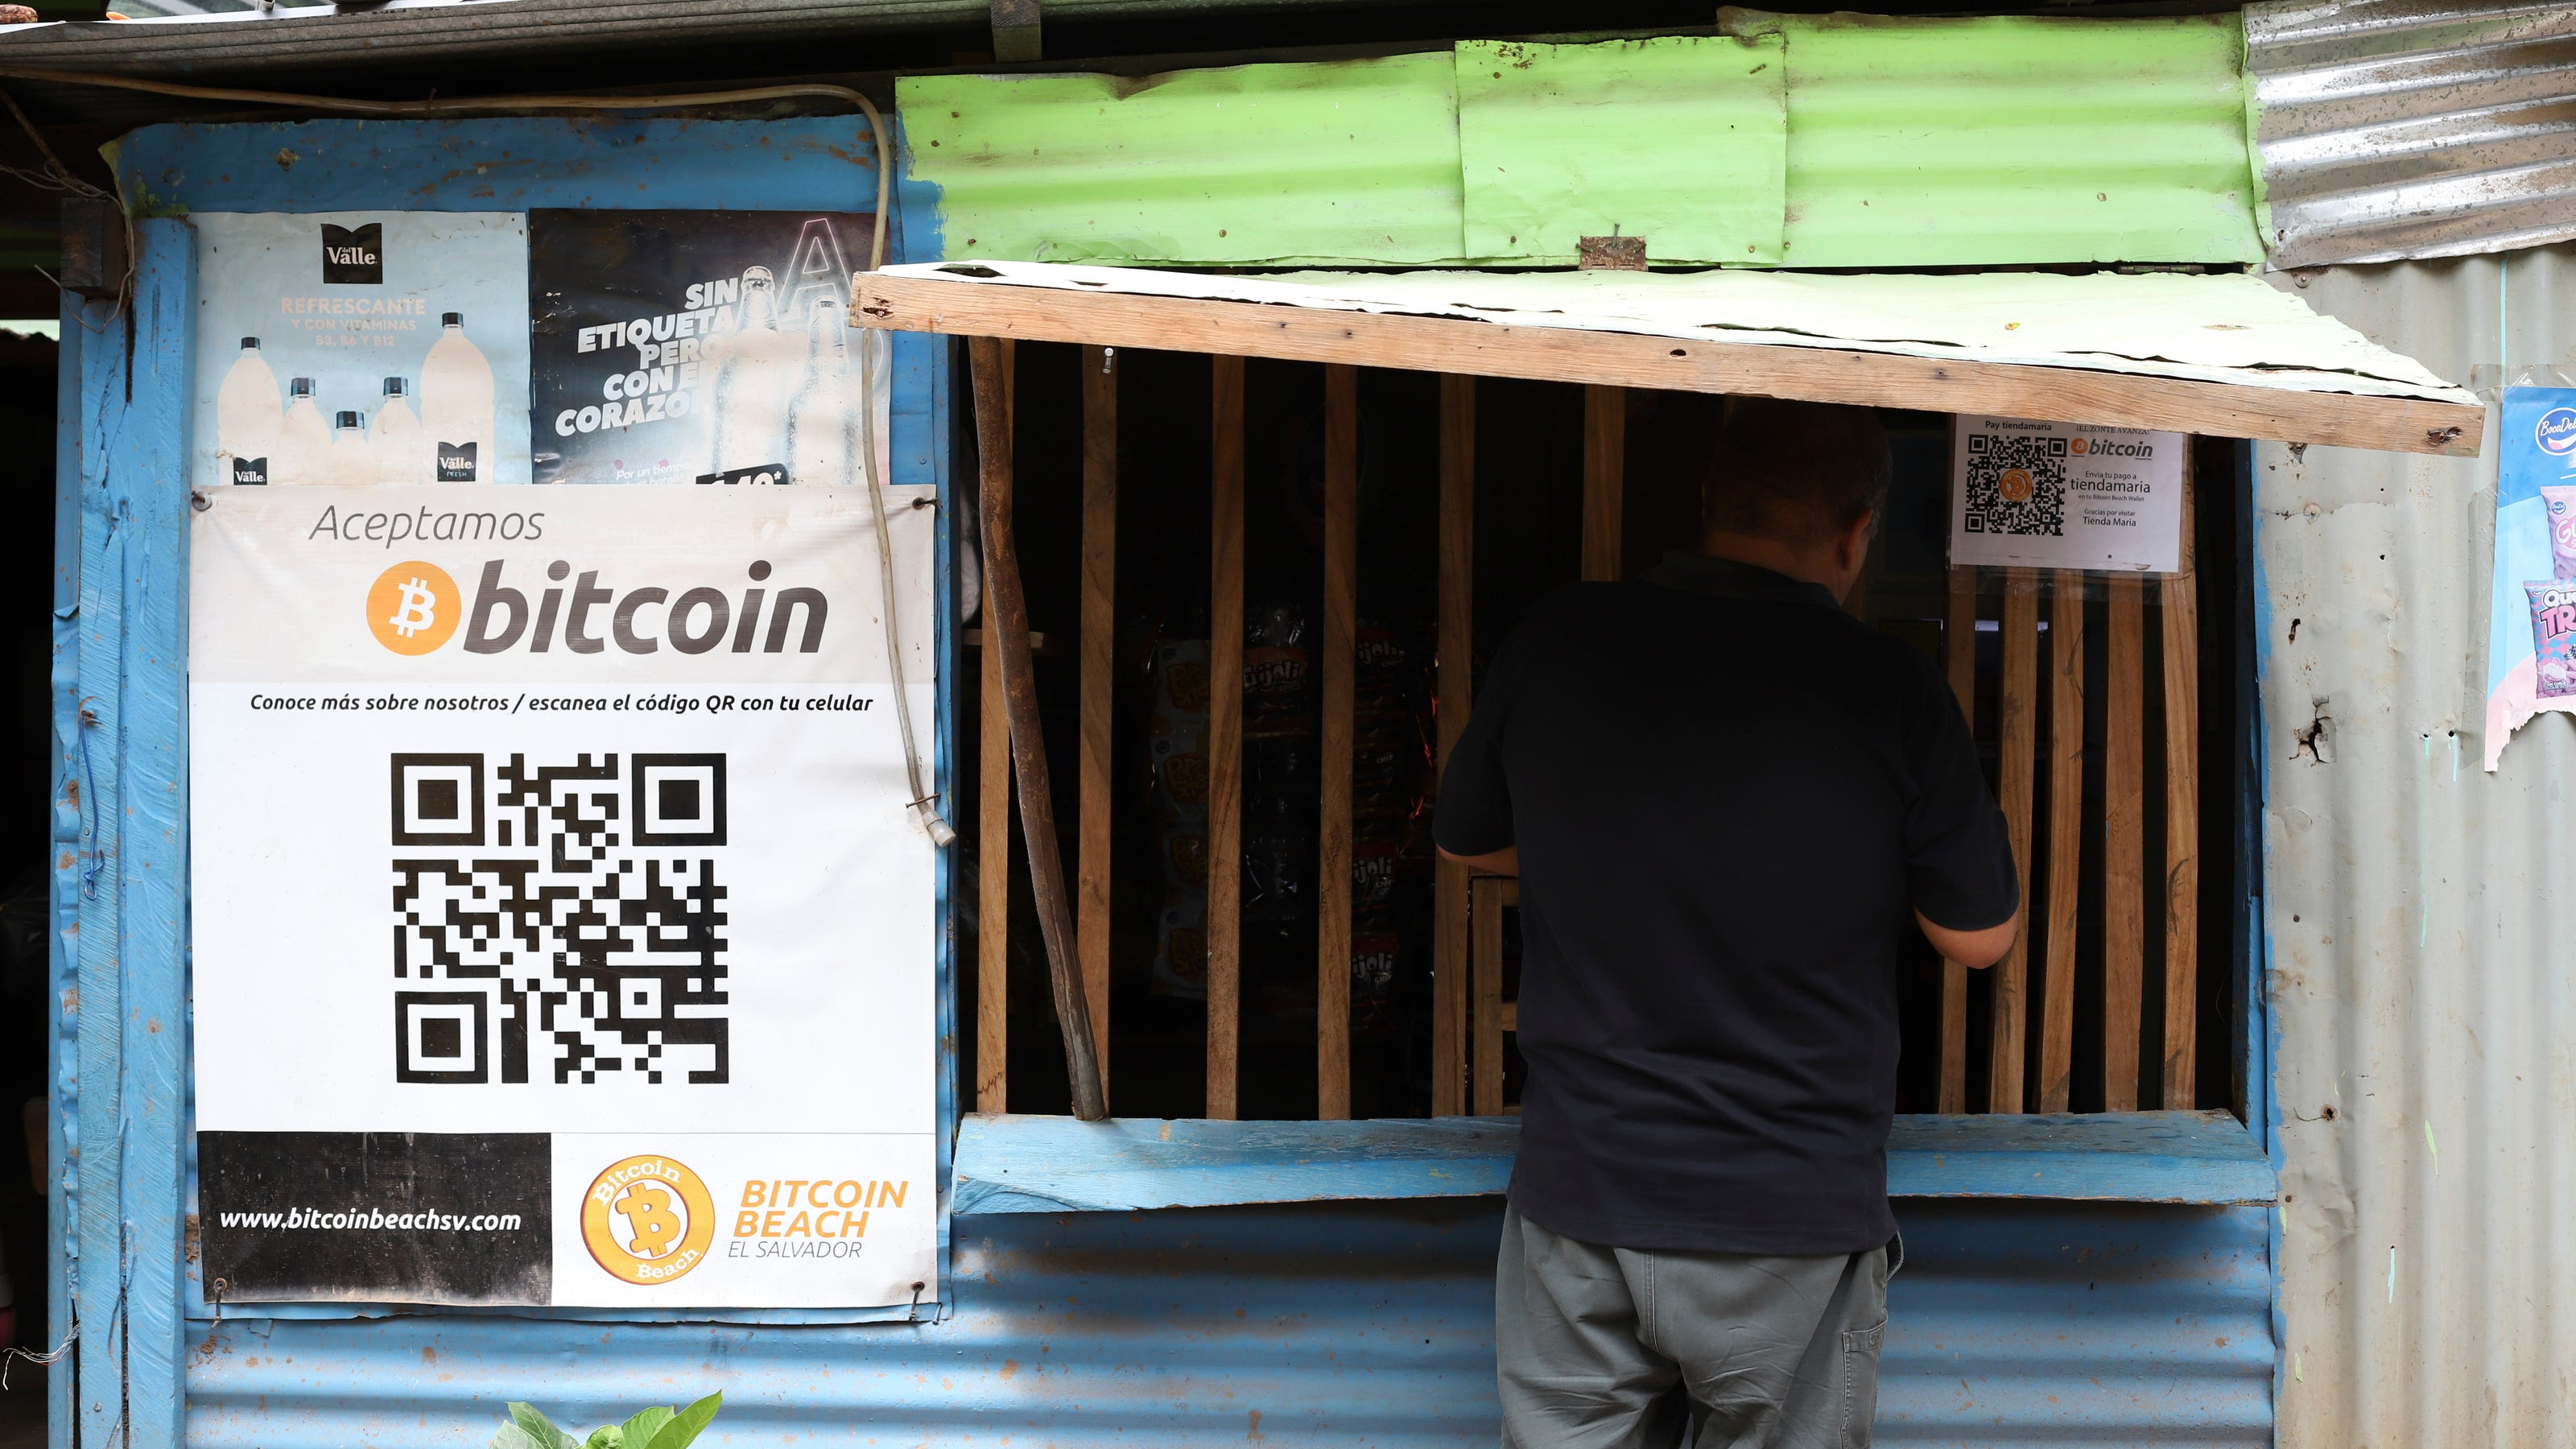 At El Salvador's Bitcoin Beach, a glimpse of crypto economy